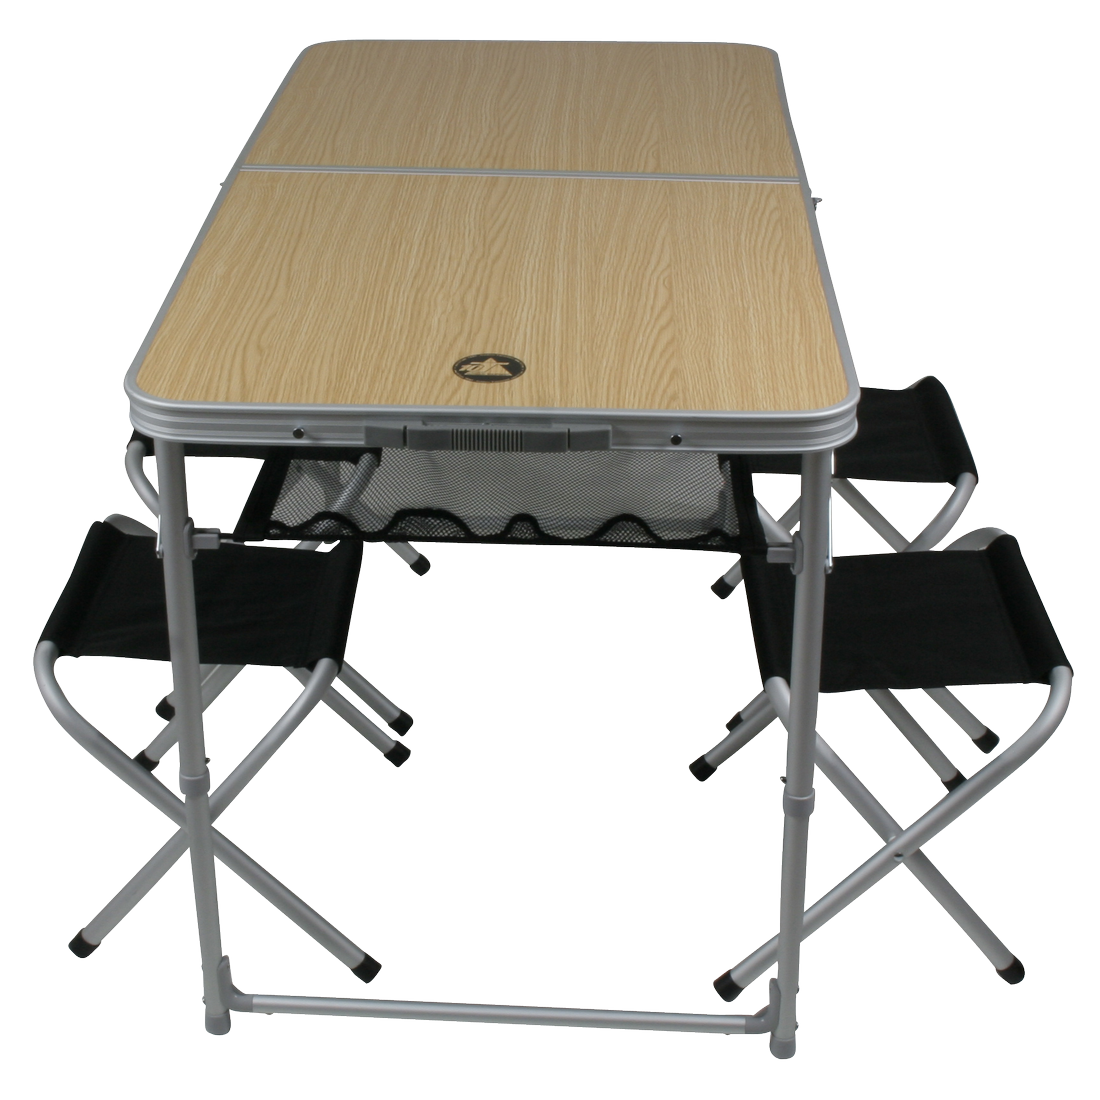 Tisch-Hocker-Set Portable Family 4 Mann Alu Campingtisch Picknick Tisch Hocker